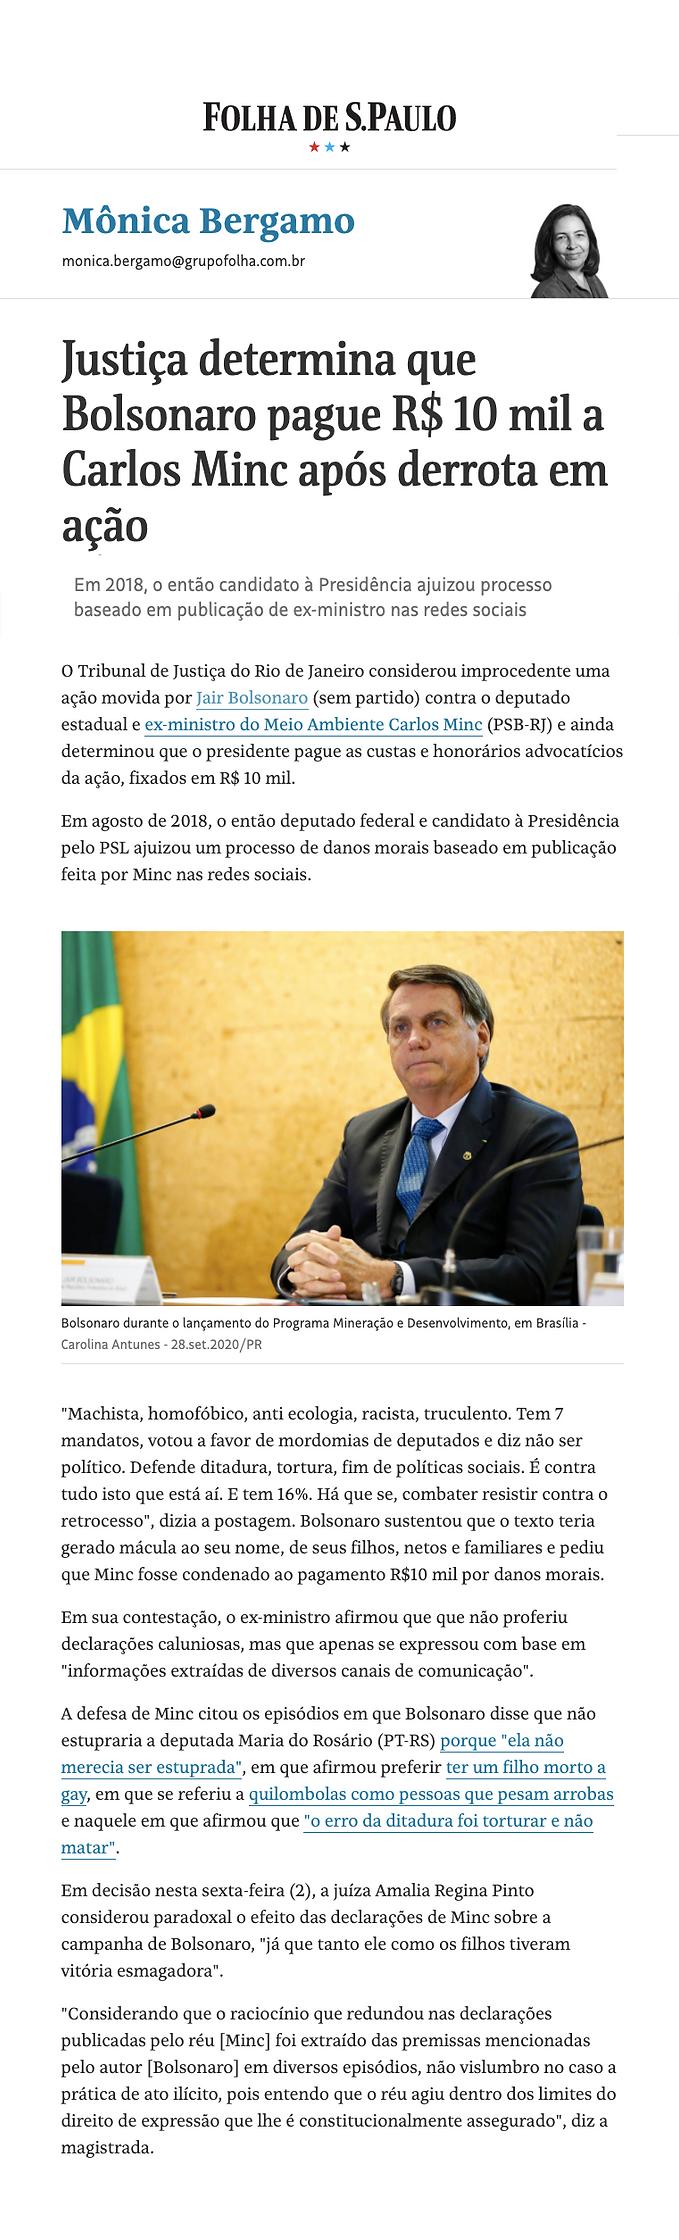 screenshot-www1.folha.uol.com.br-2020.10